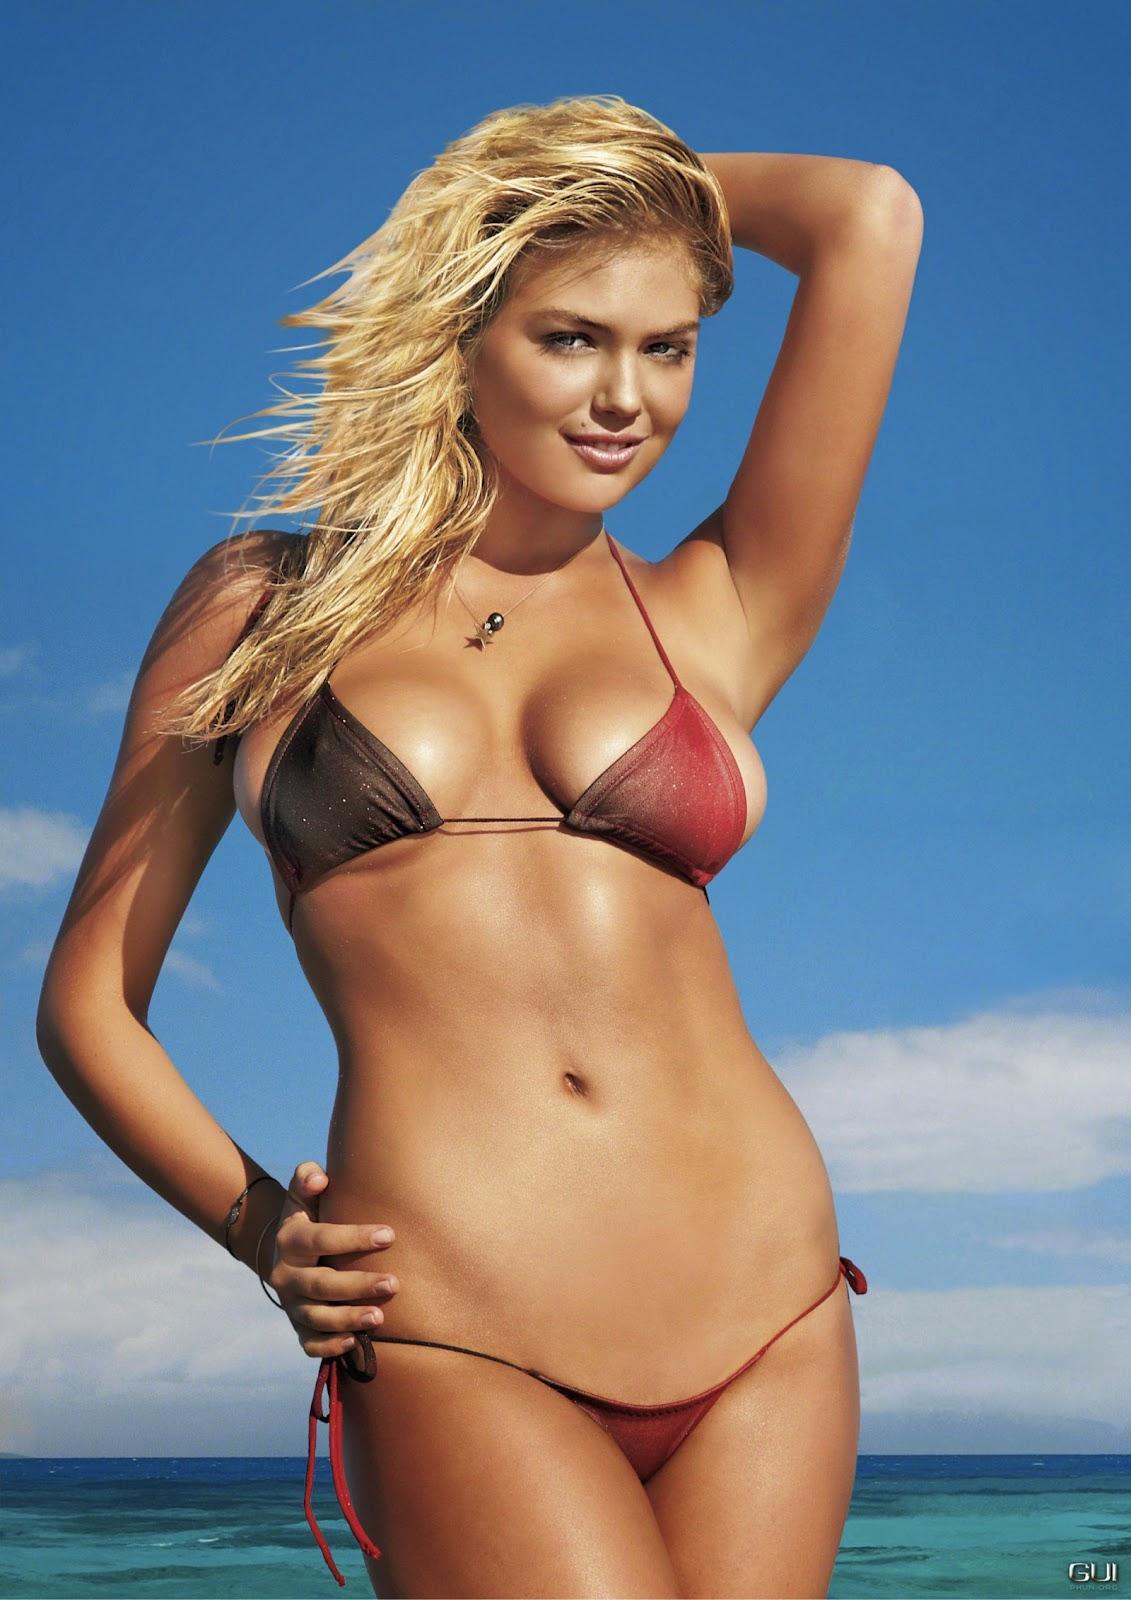 swimsuit Bikini model and